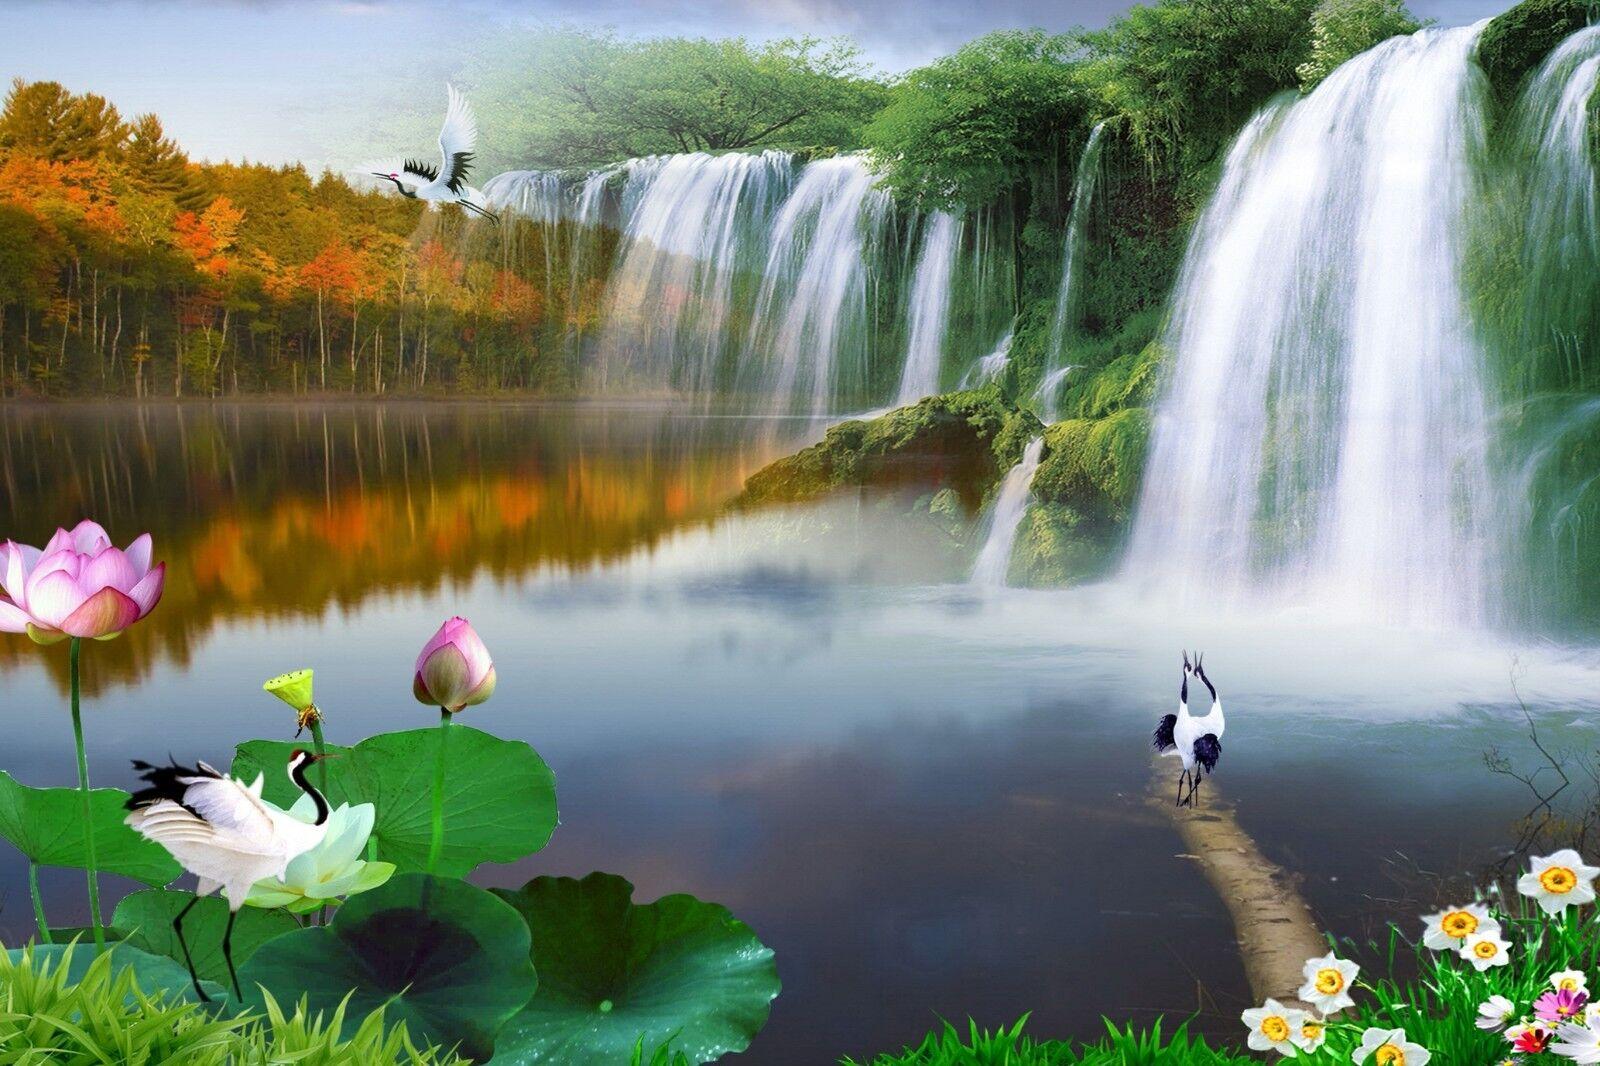 3D Wasserfall Landschaft Landschaft Landschaft 8983 Tapete Wandgemälde Tapeten Bild Familie DE Jenny  | Sale  | Clever und praktisch  | Fuxin  9e9355